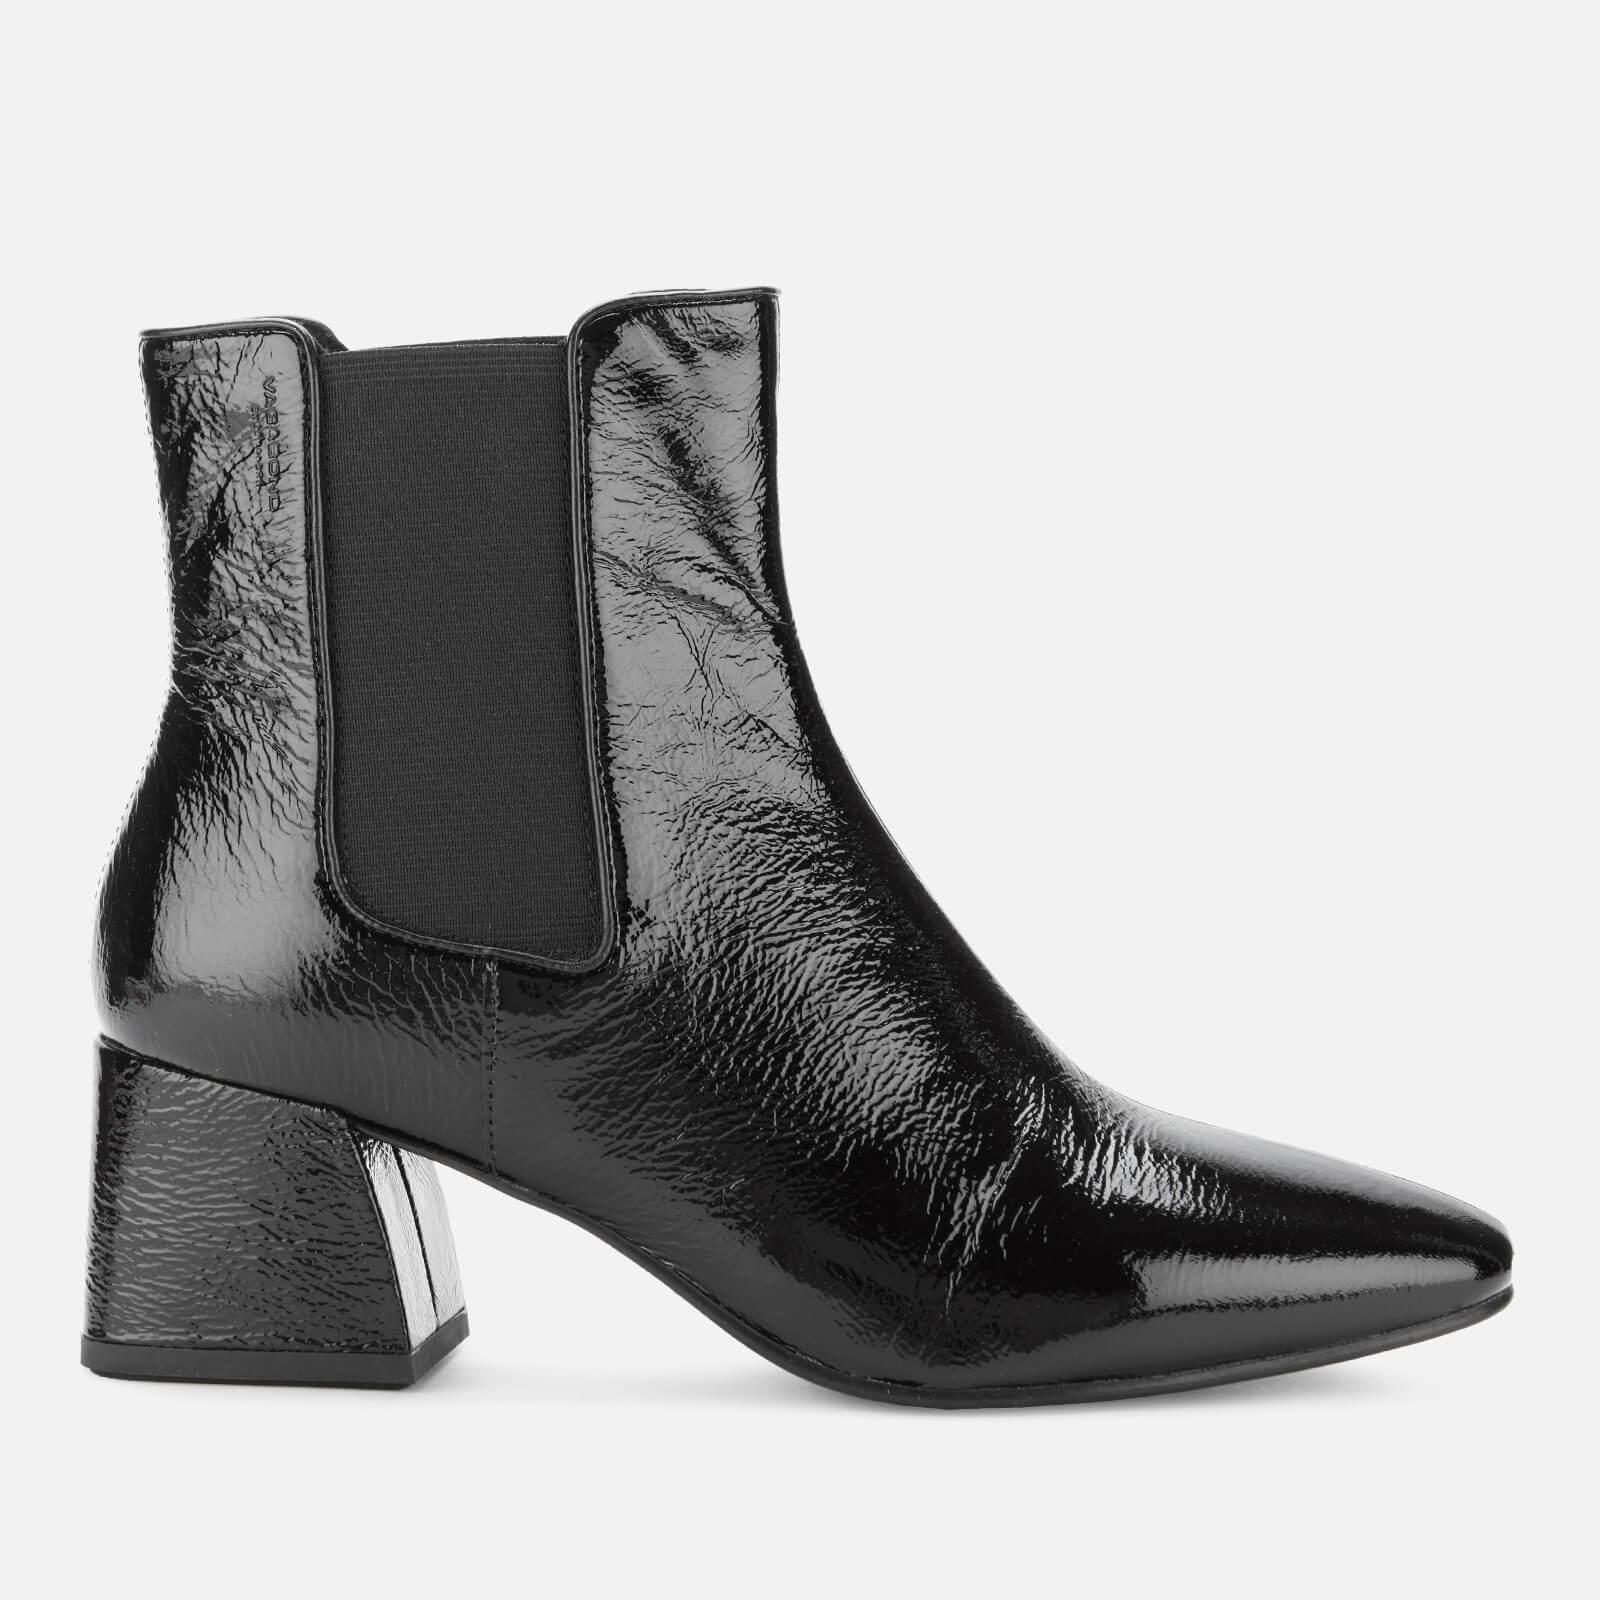 Vagabond Women's Alice Patent Leather Heeled Chelsea Boots - Black - UK 4